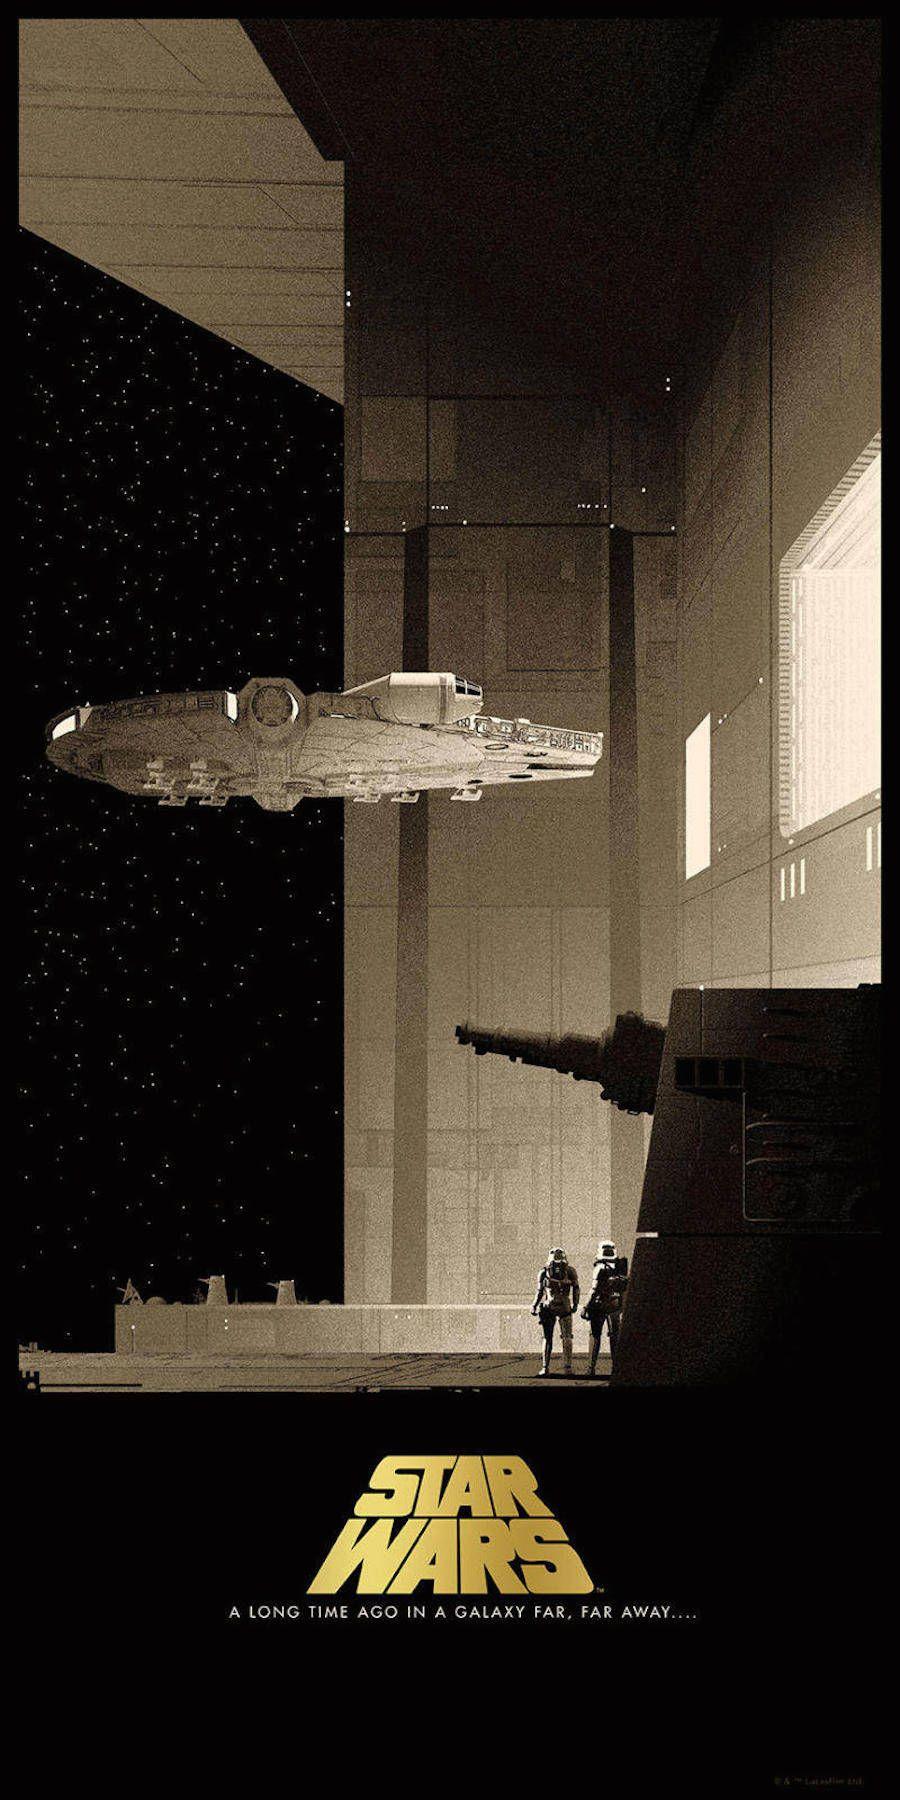 Comics-Like Illustrated Star Wars Posters – Fubiz Media